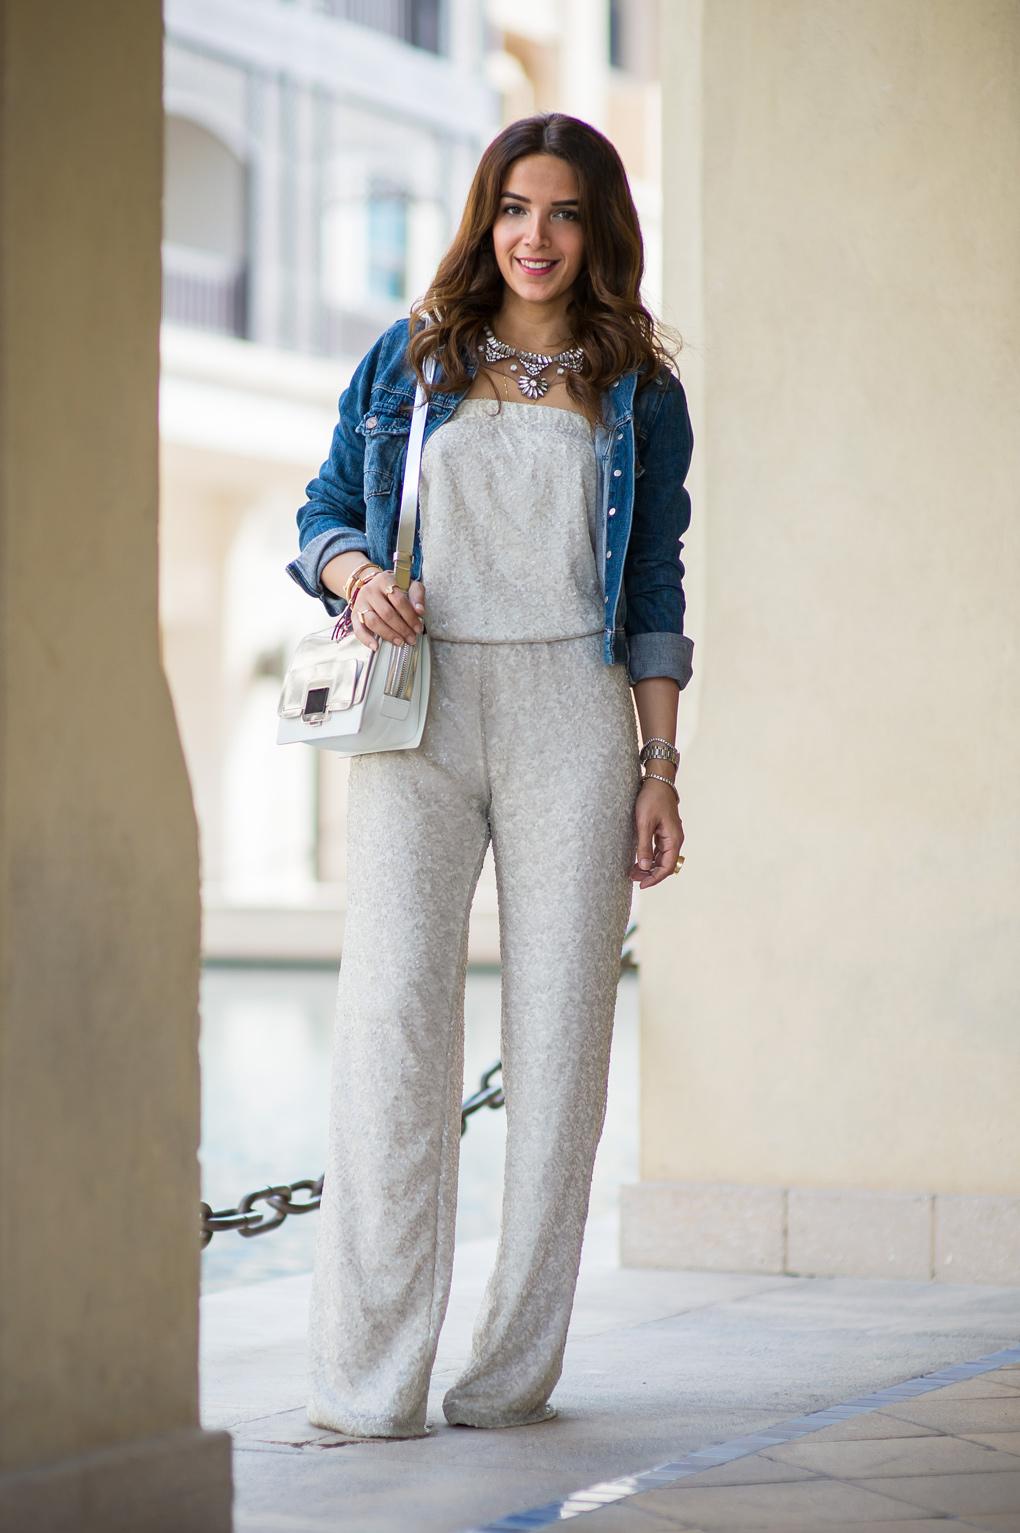 Lyla_Loves_Fashion_Michelle_Belau_Roger_Vivier_Bag_024